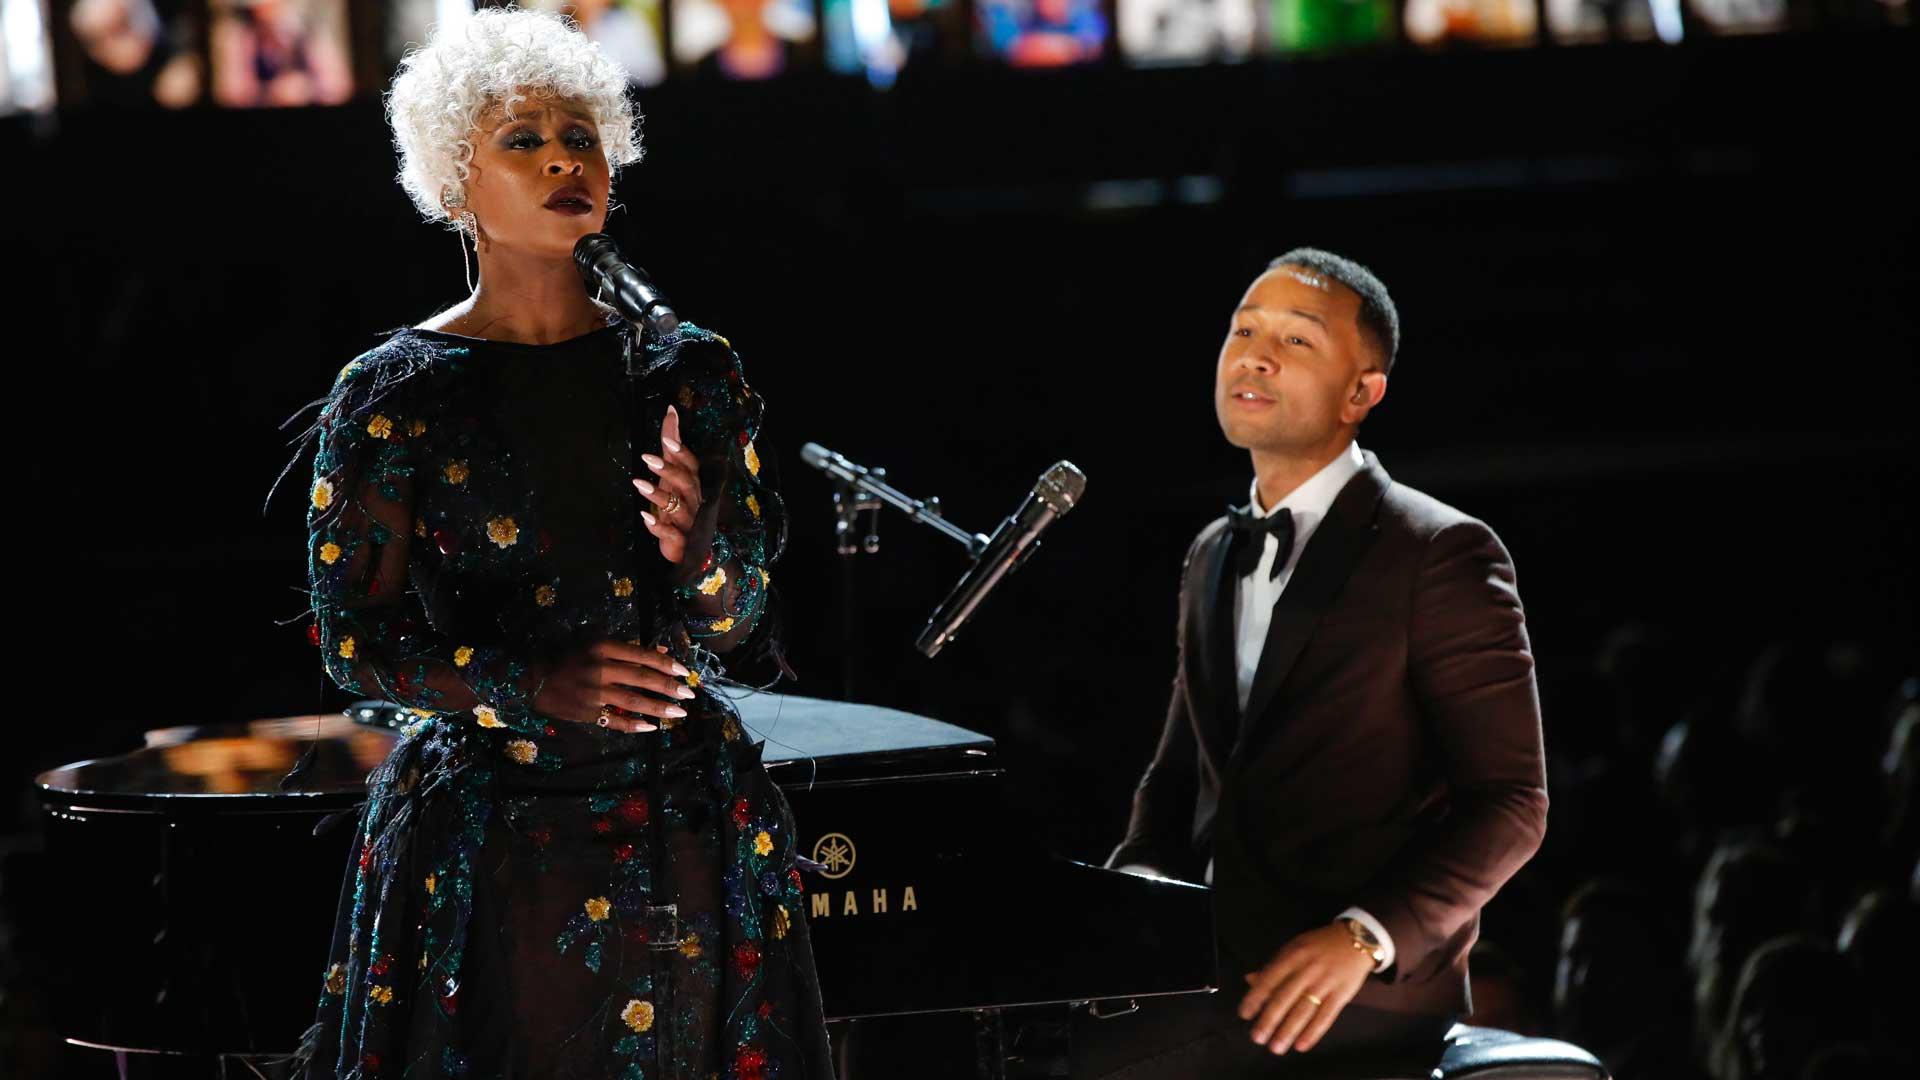 John Legend and Cynthia Erivo perform